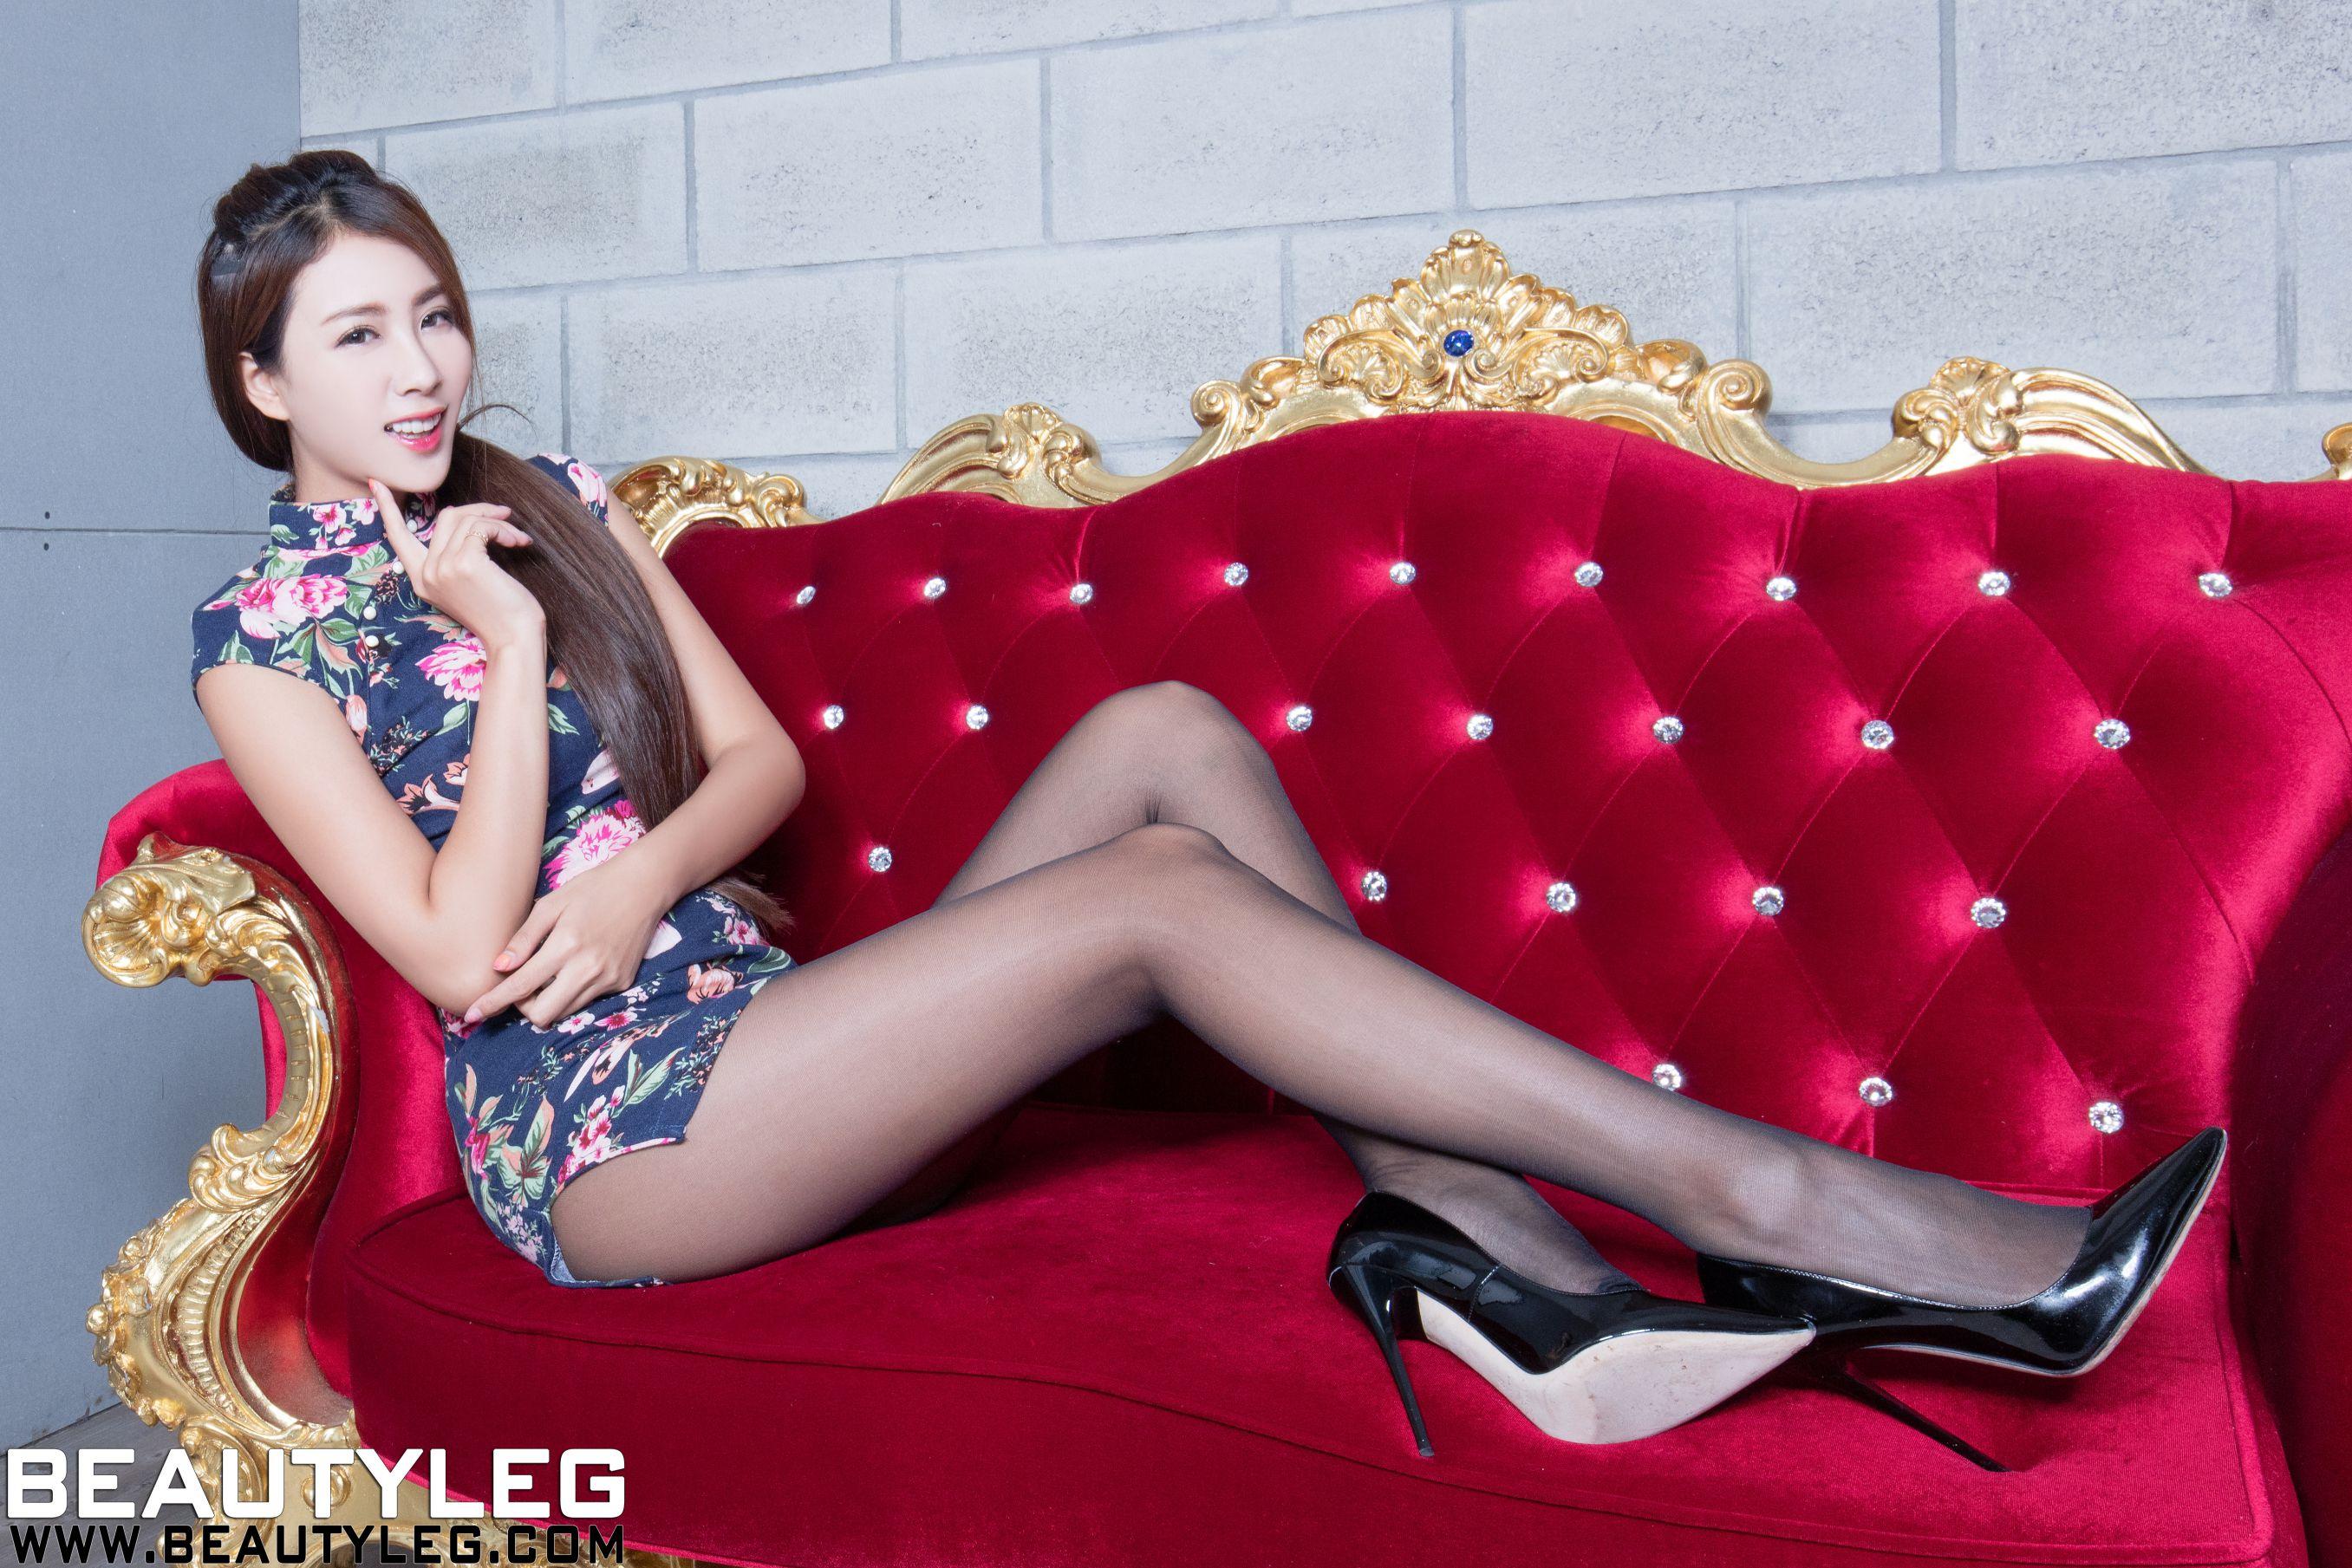 VOL.679 [Beautyleg]美腿旗袍黑丝腿模:夏晴(夏晴Miso,腿模Miso)超高清个人性感漂亮大图(32P)